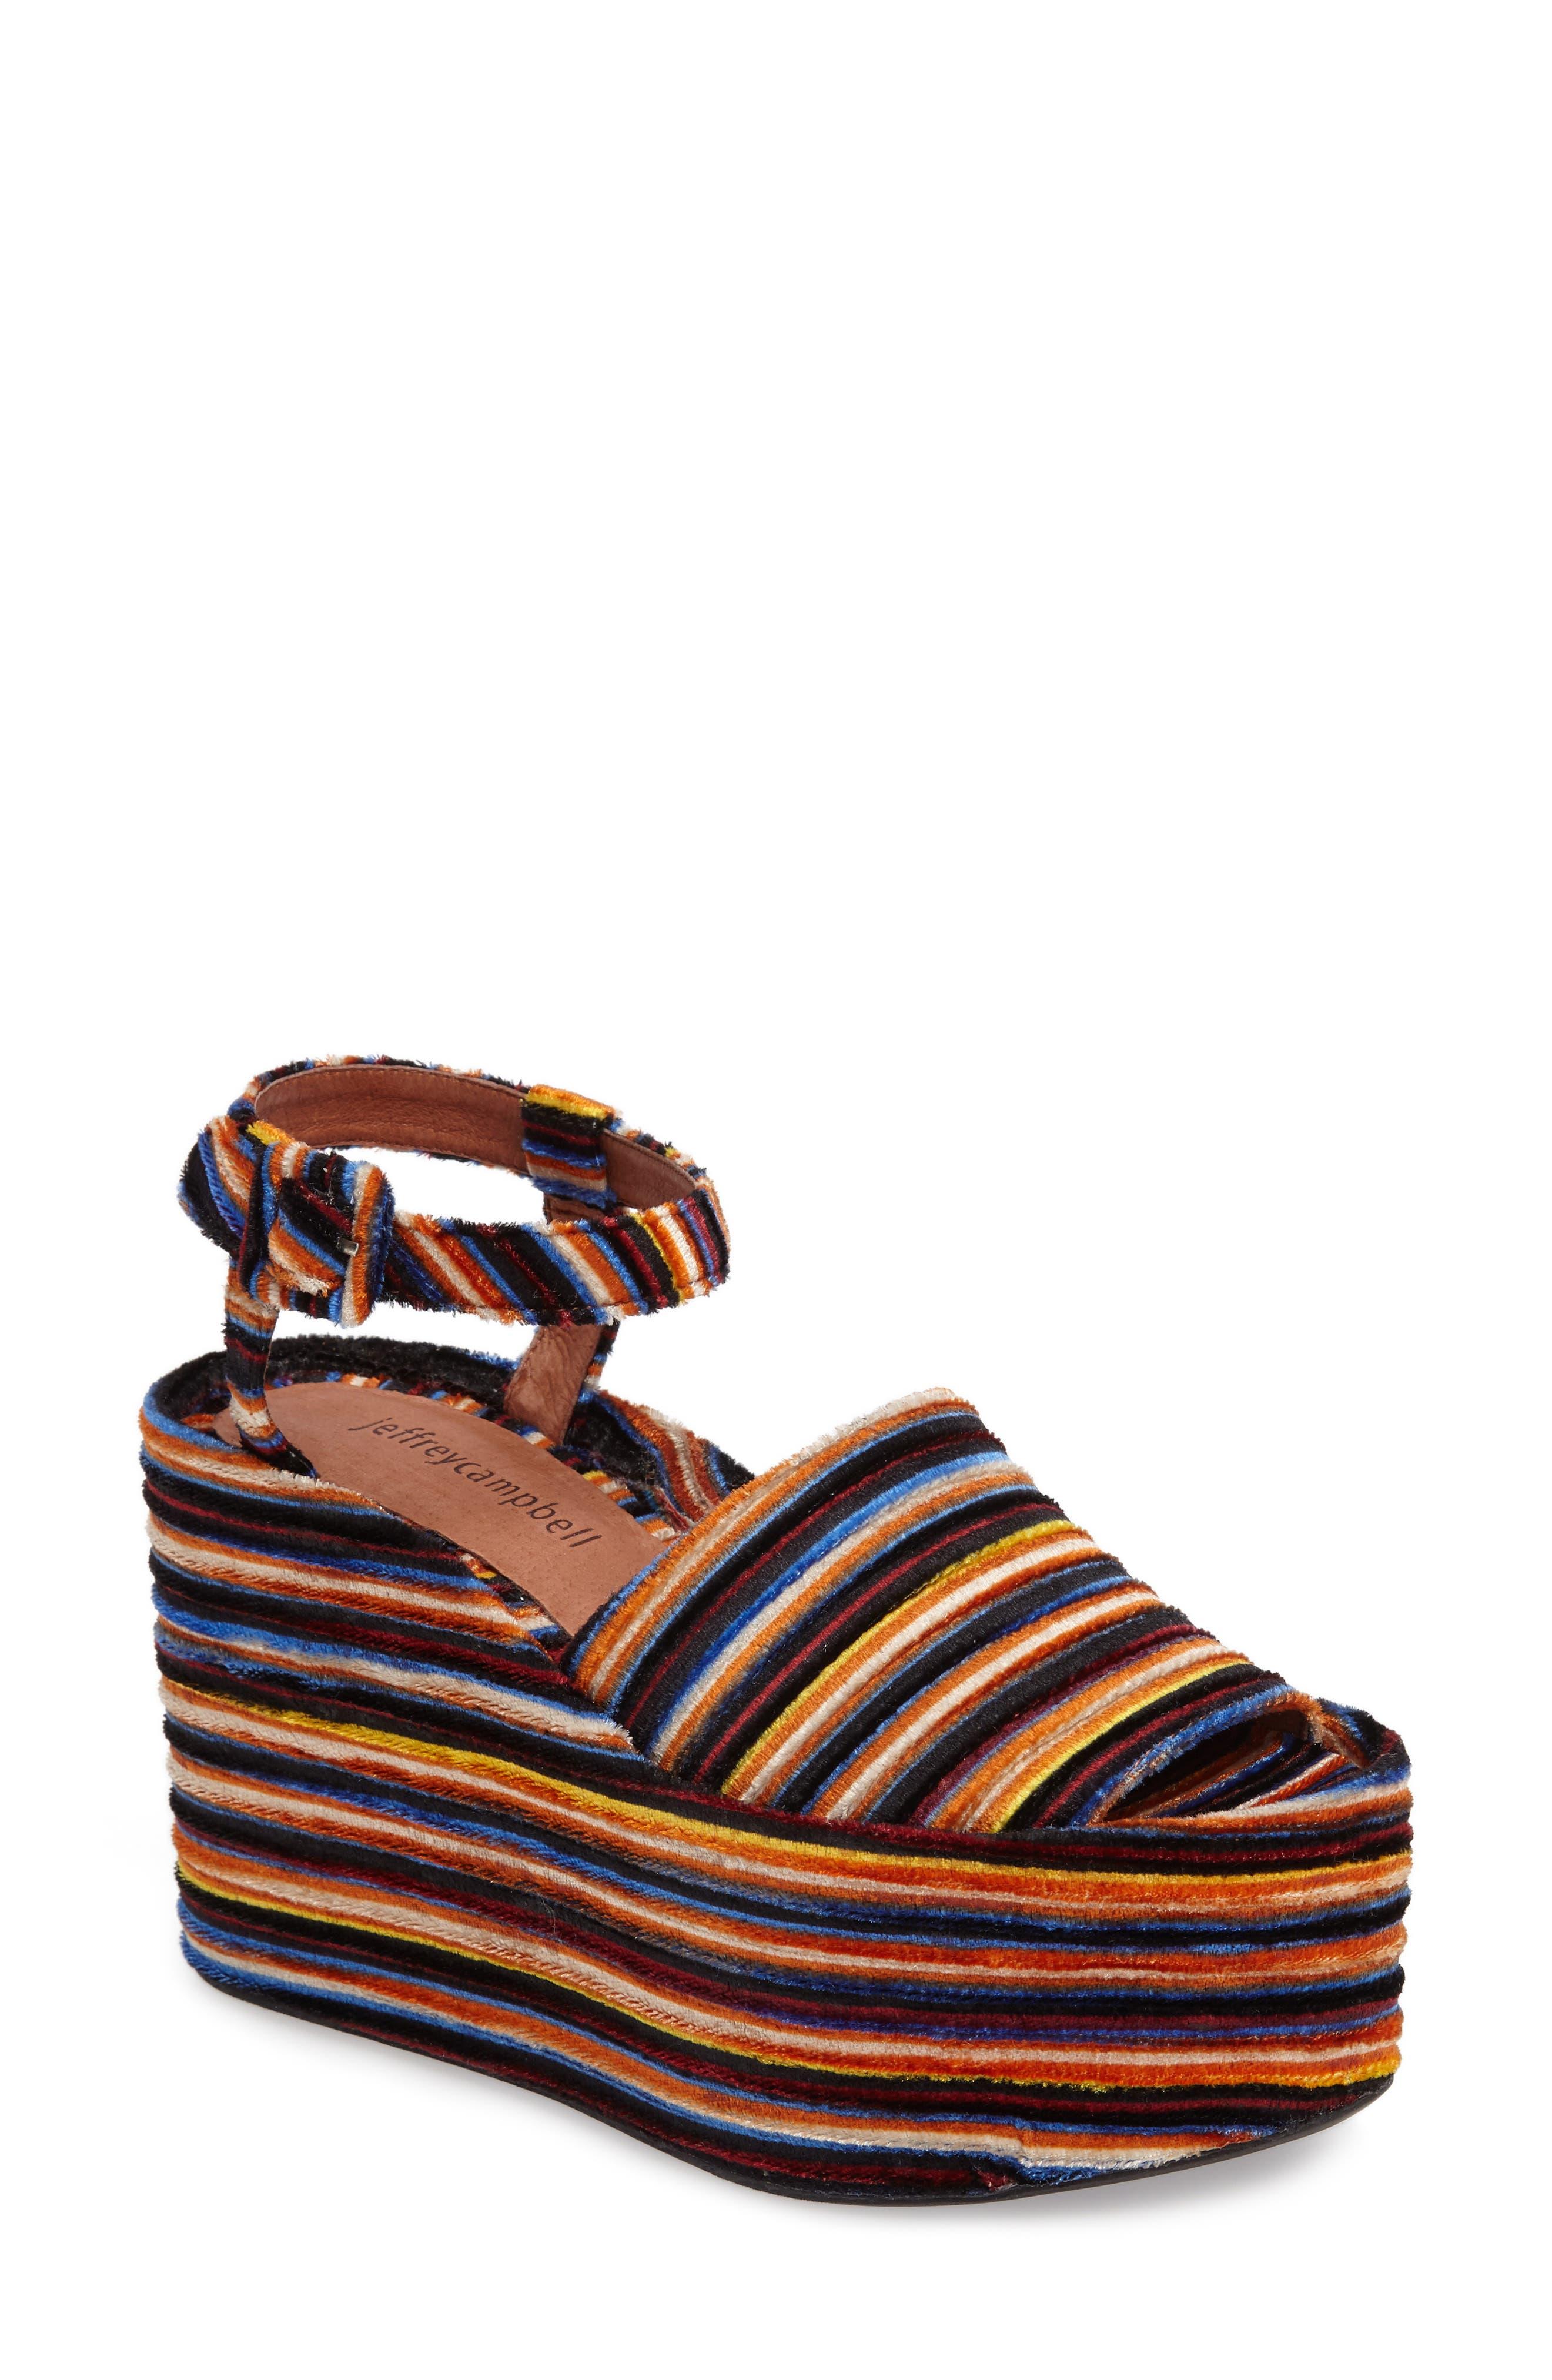 Main Image - Jeffrey Campbell Chynna Platform Sandal (Women)